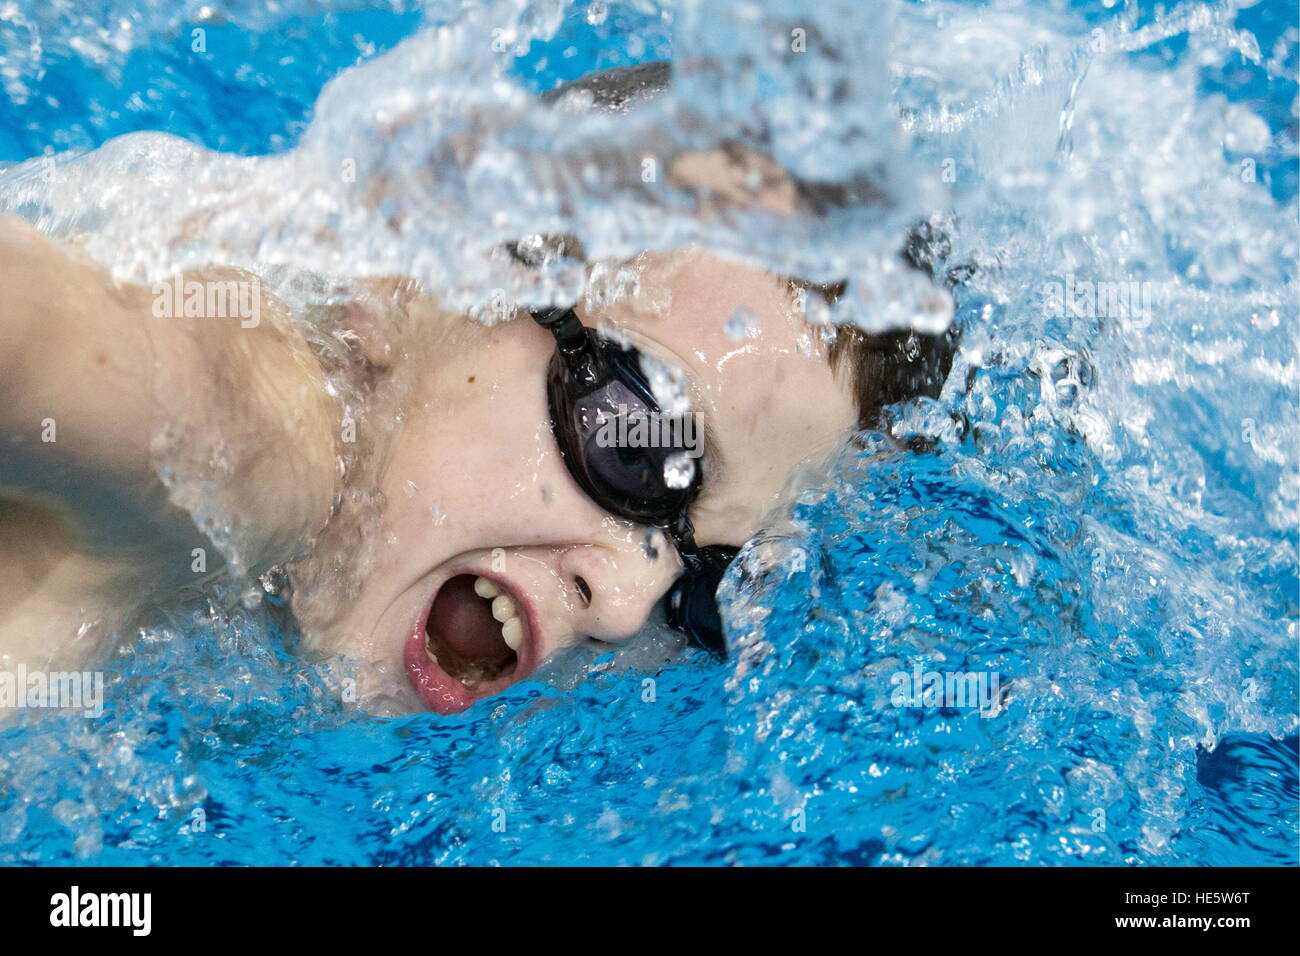 Omsk, Russland. 16. Dezember 2016. Ein Teilnehmer in einem Swimming-Wettbewerb in Omsk Kadettenkorps. © Dmitry Feoktistov/TASS/Alamy Stockfoto